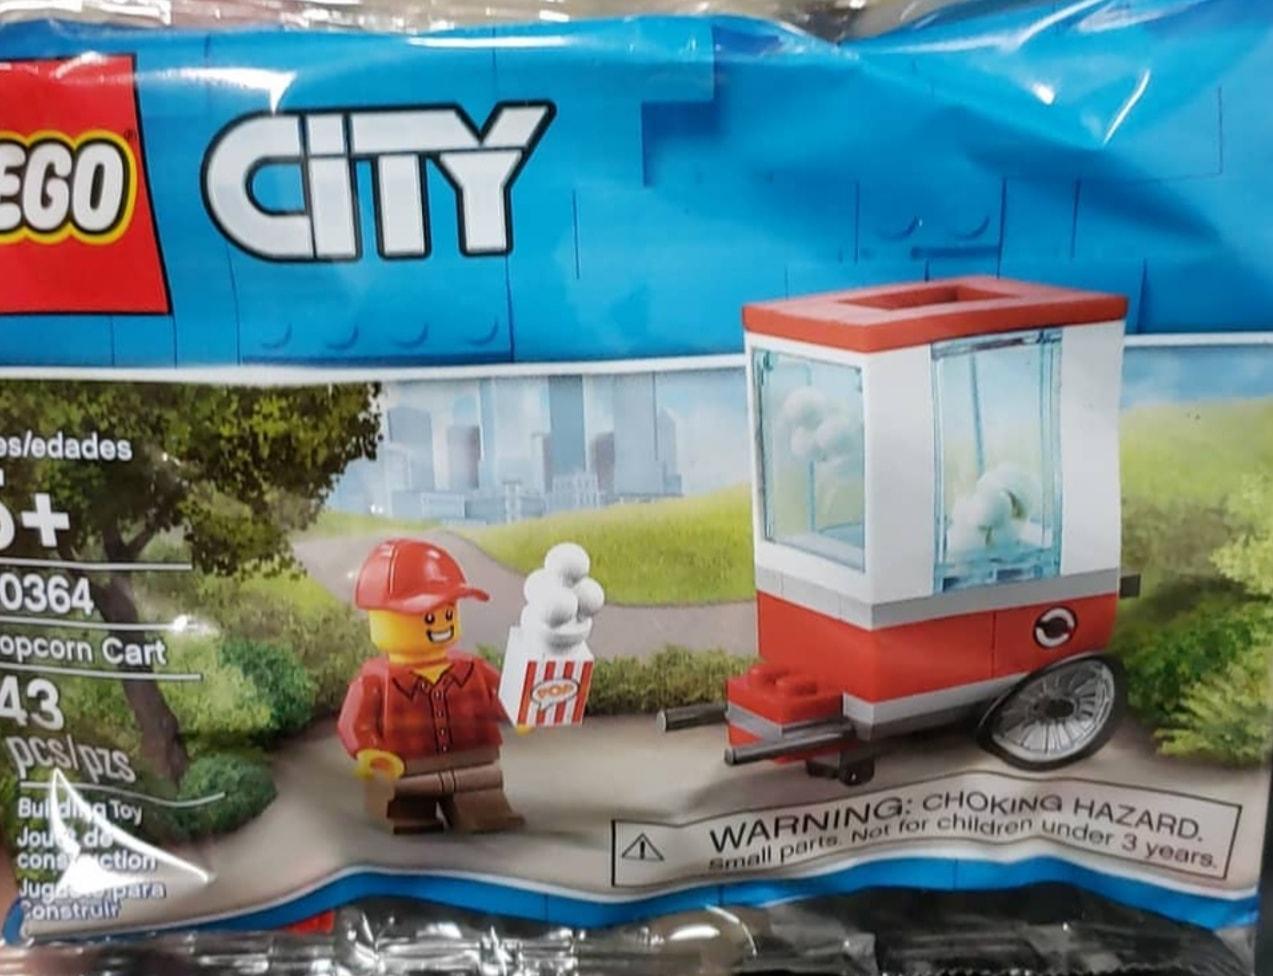 lego-city-popcorn-cart-wagen-30364-polybag-2019 zusammengebaut.com